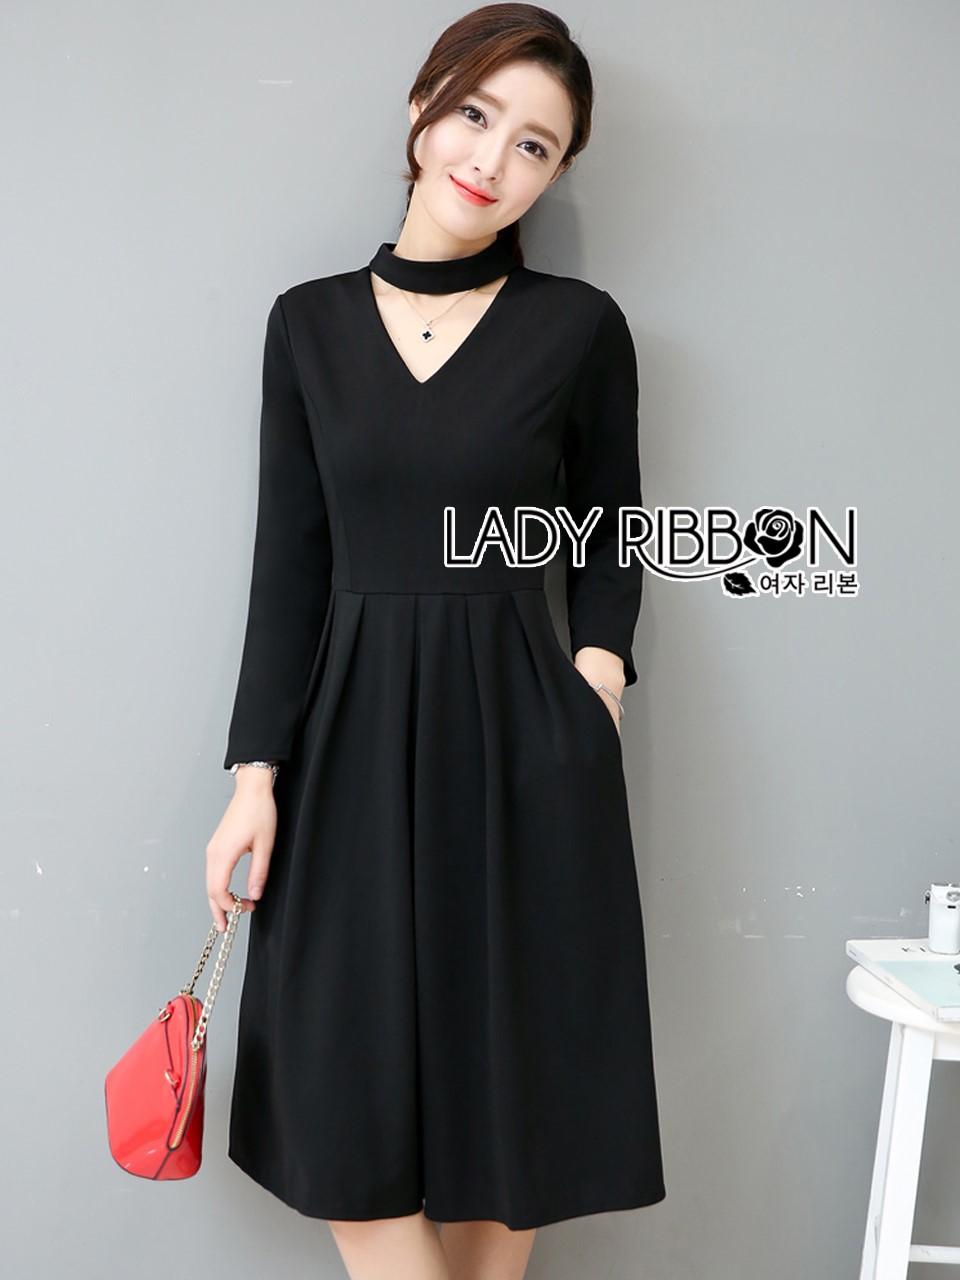 &#x1F380 Lady Ribbon's Made &#x1F380 Lady Lily Minimal Elegant Cut-Out Plain Black Dress